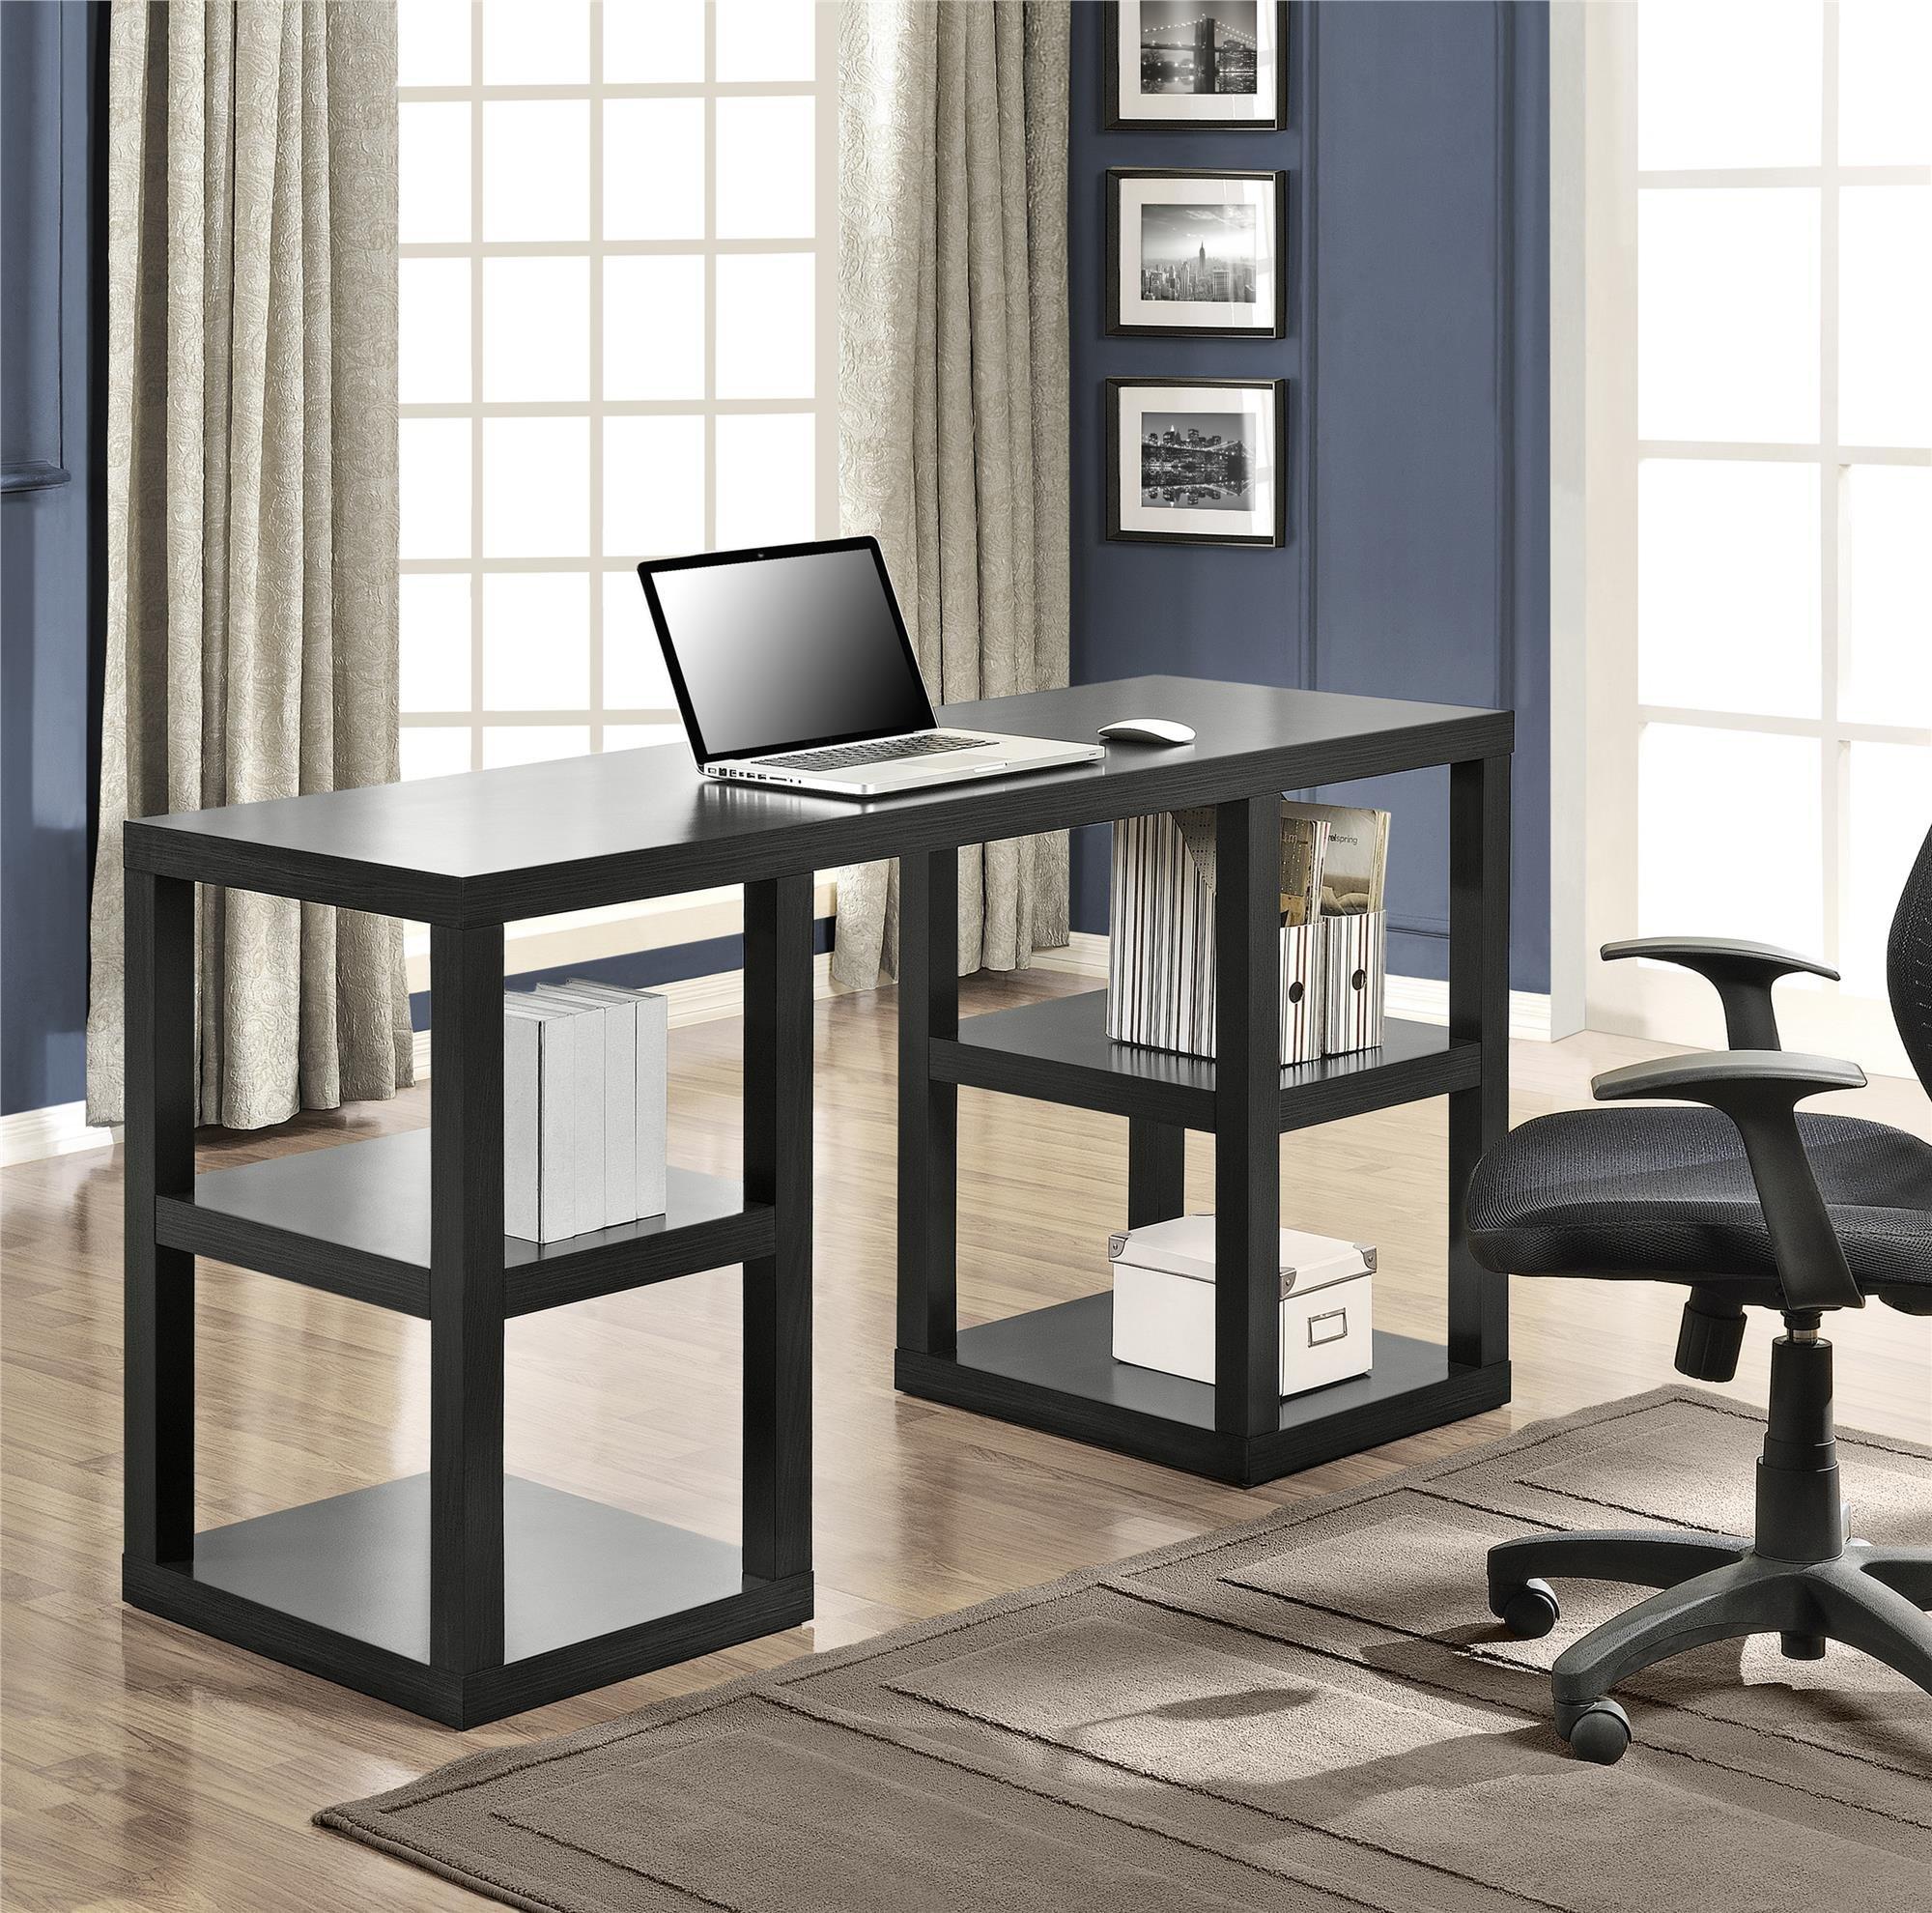 Altra Deluxe Parsons Desk, Black Oak